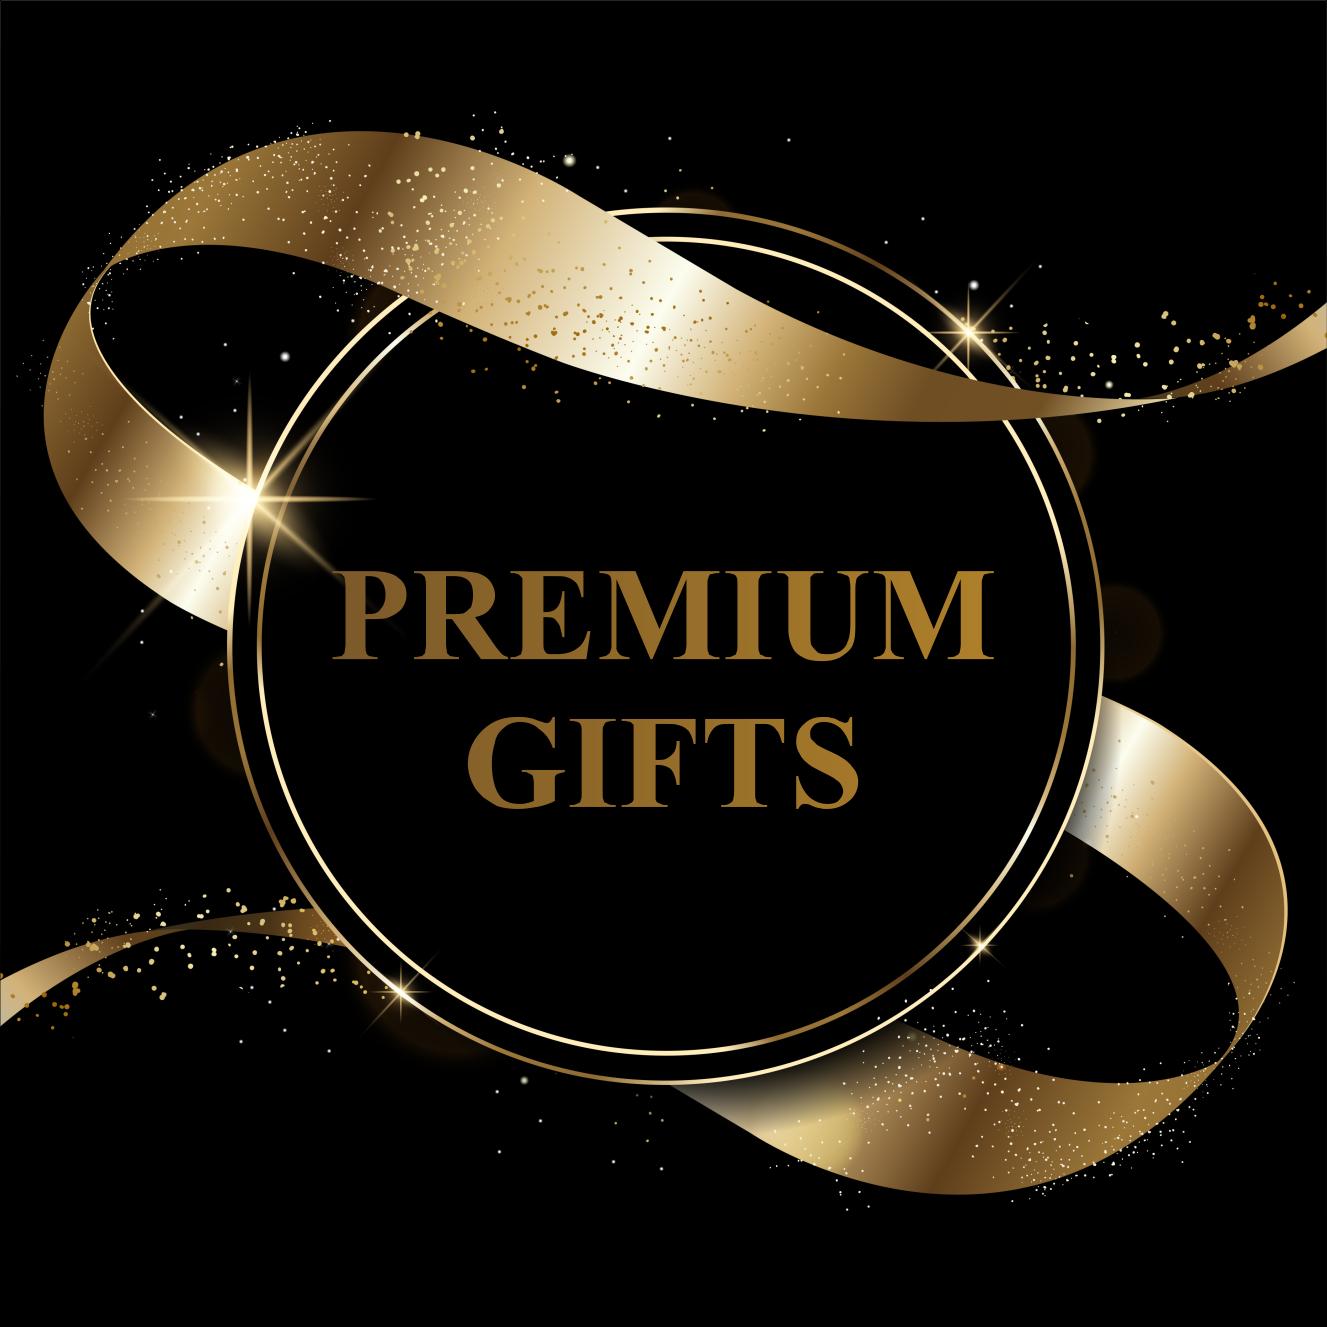 #Premium Gifts